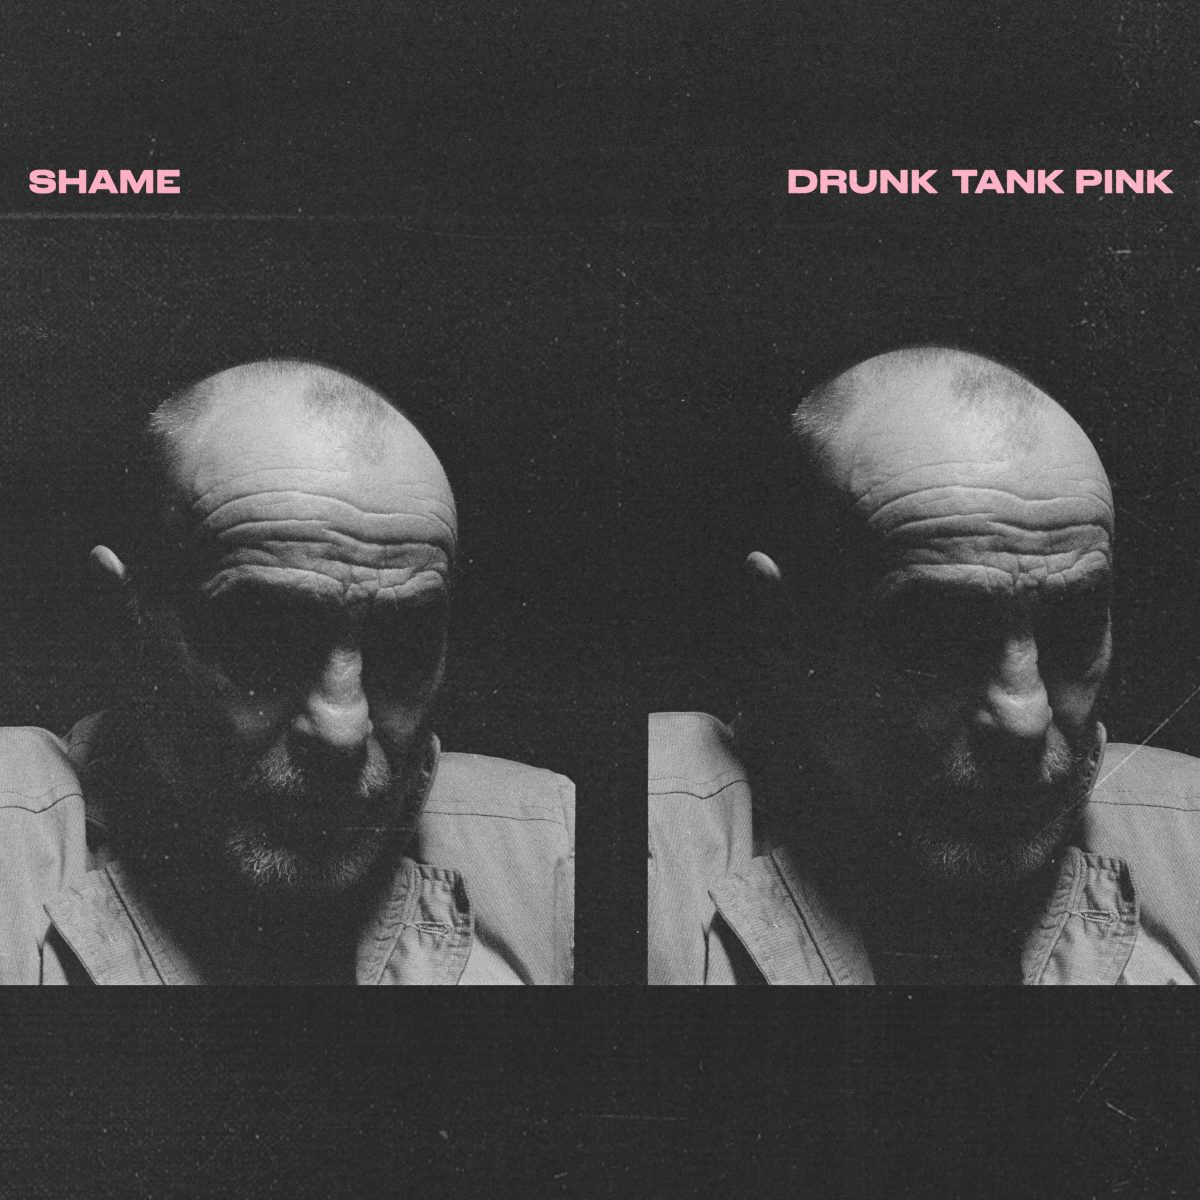 Shame Drunk Tank Pink album art